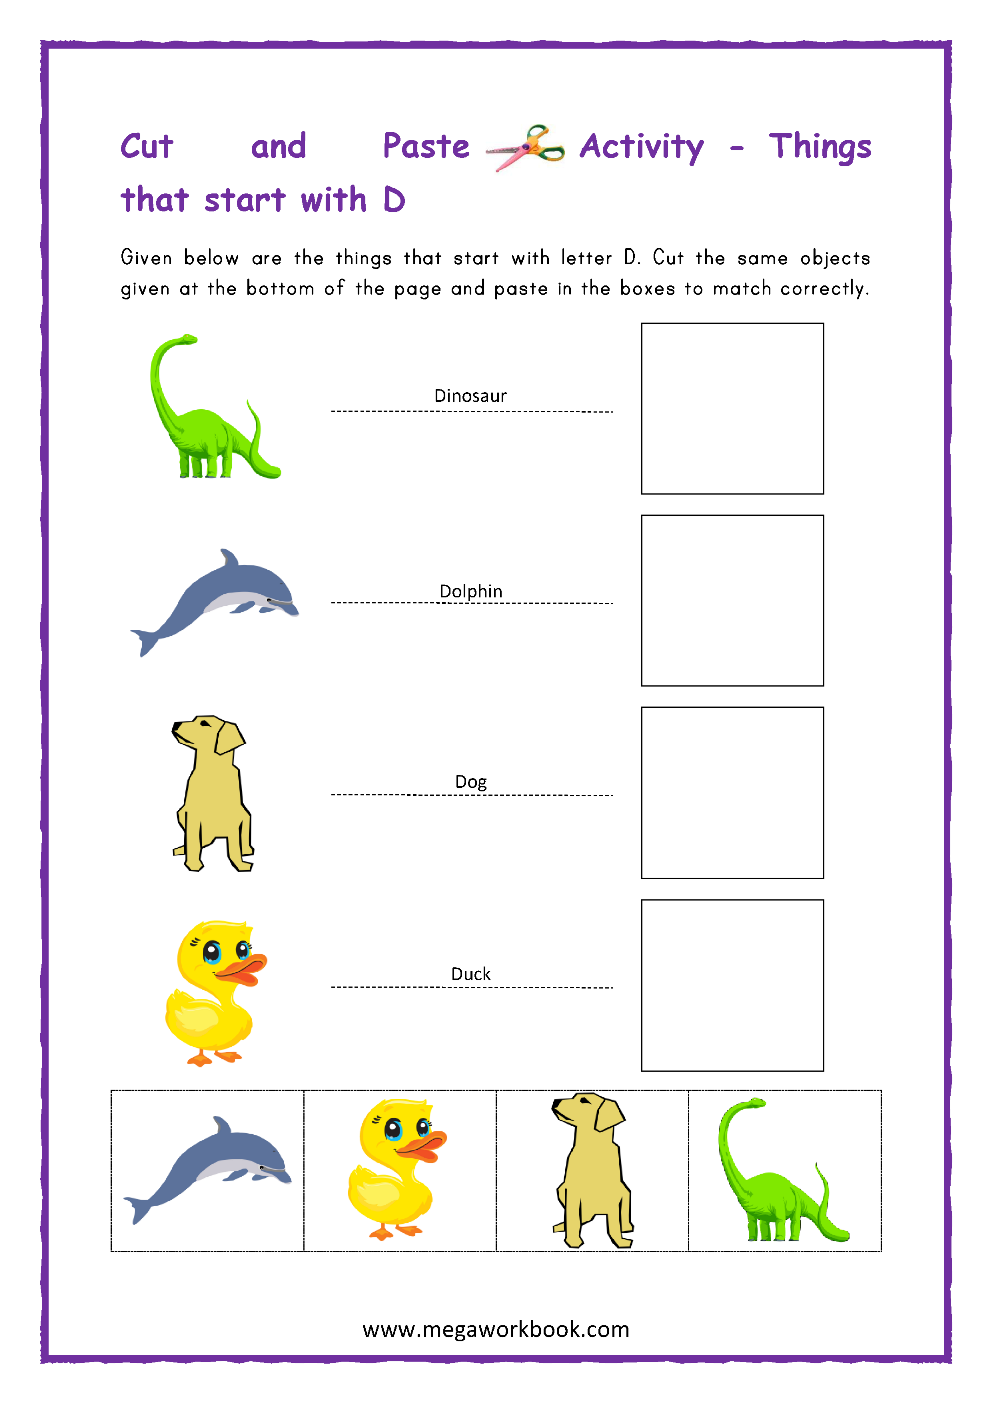 Letter D Activities - Letter D Worksheets - Letter D regarding Letter D Worksheets Cut And Paste